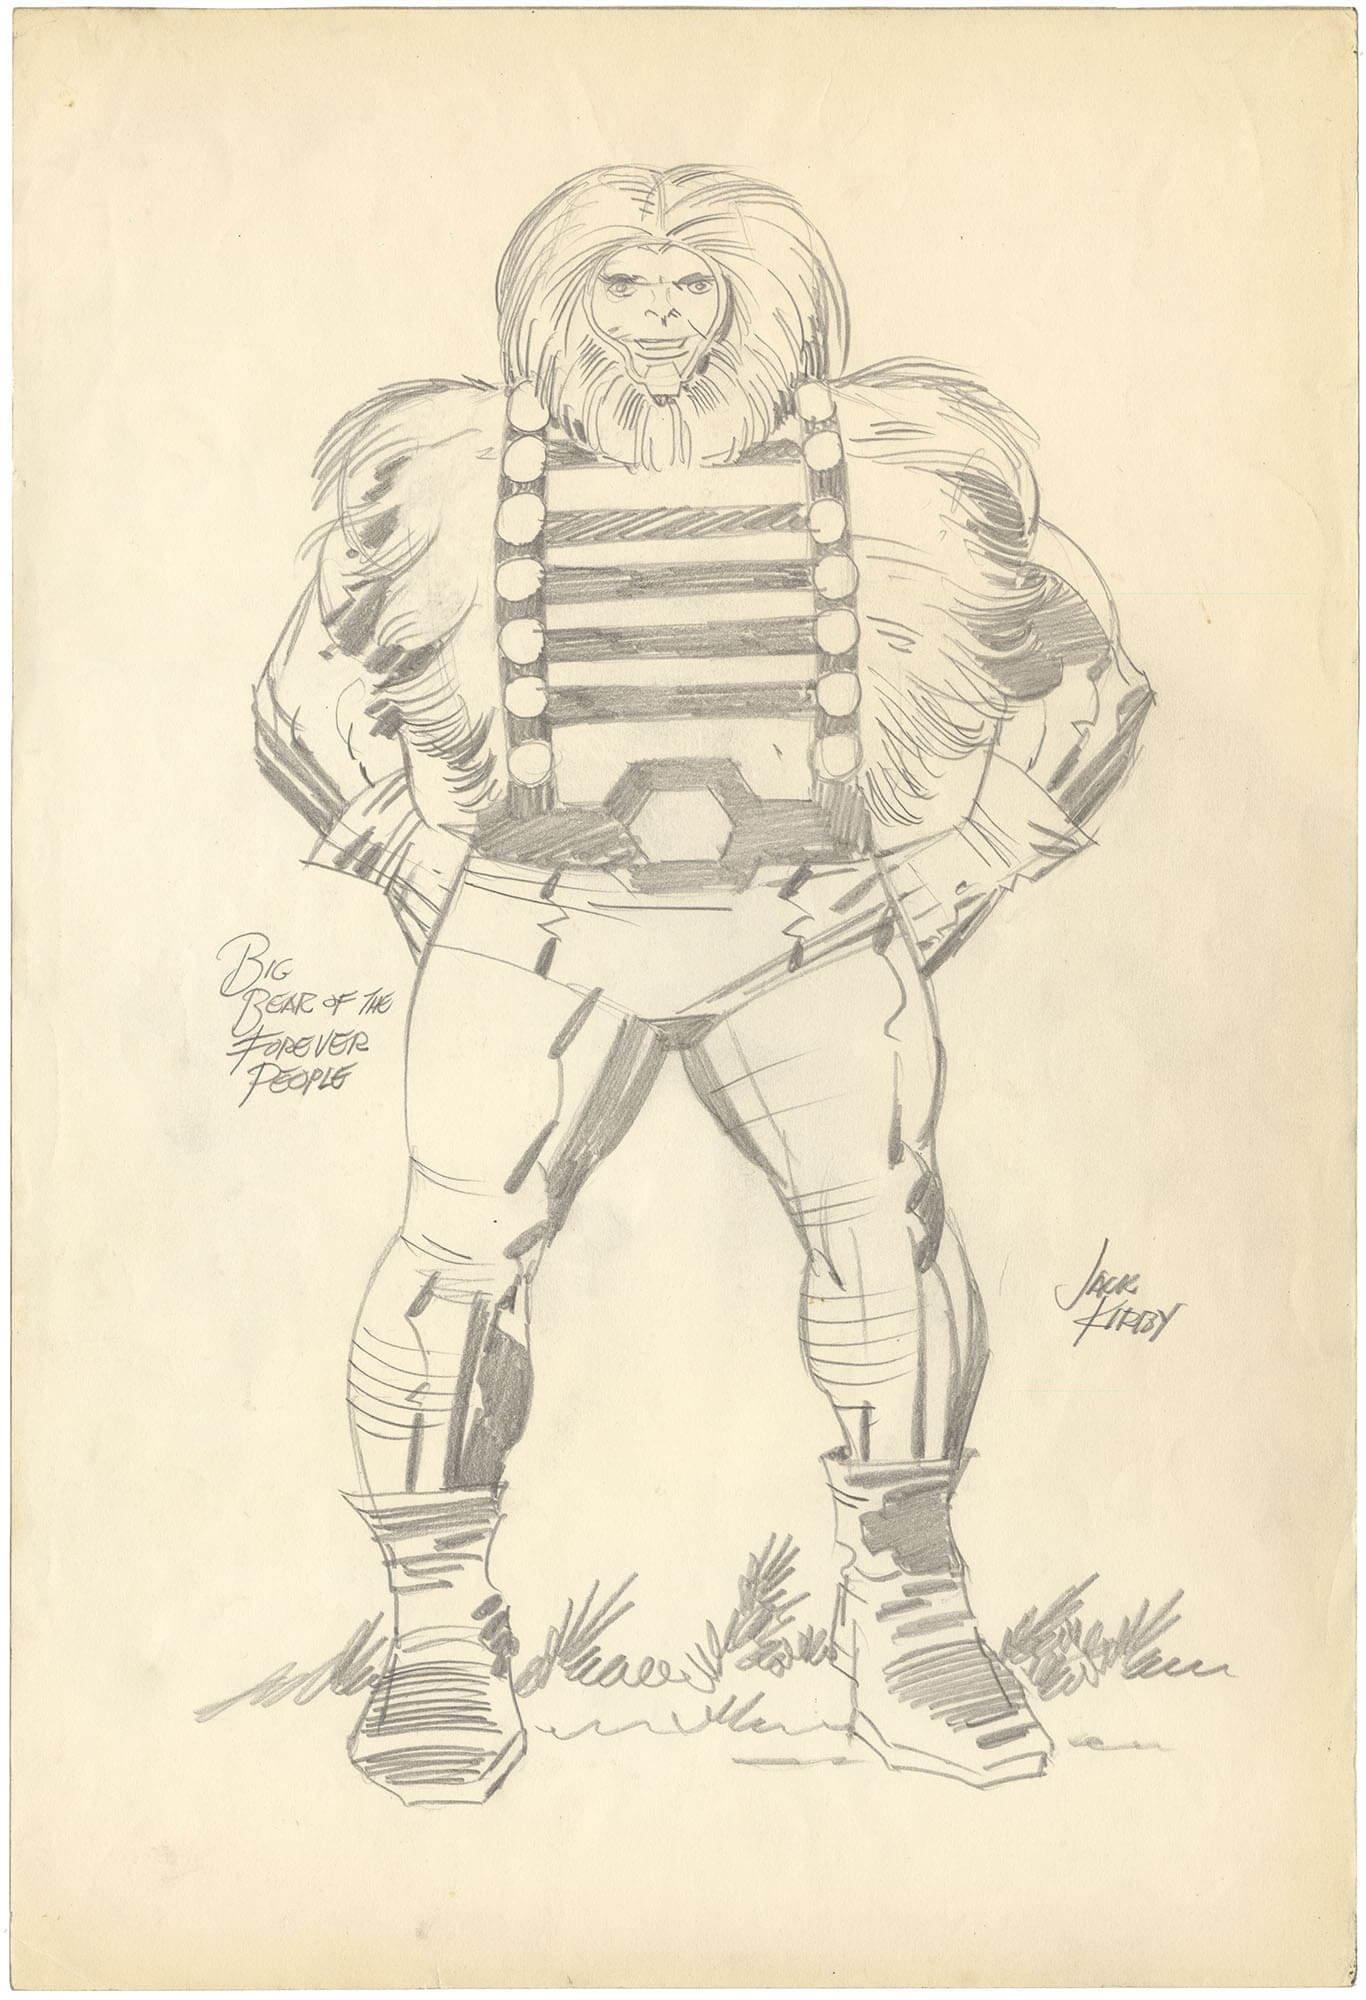 Big Bear Pencil - Signed Kirby